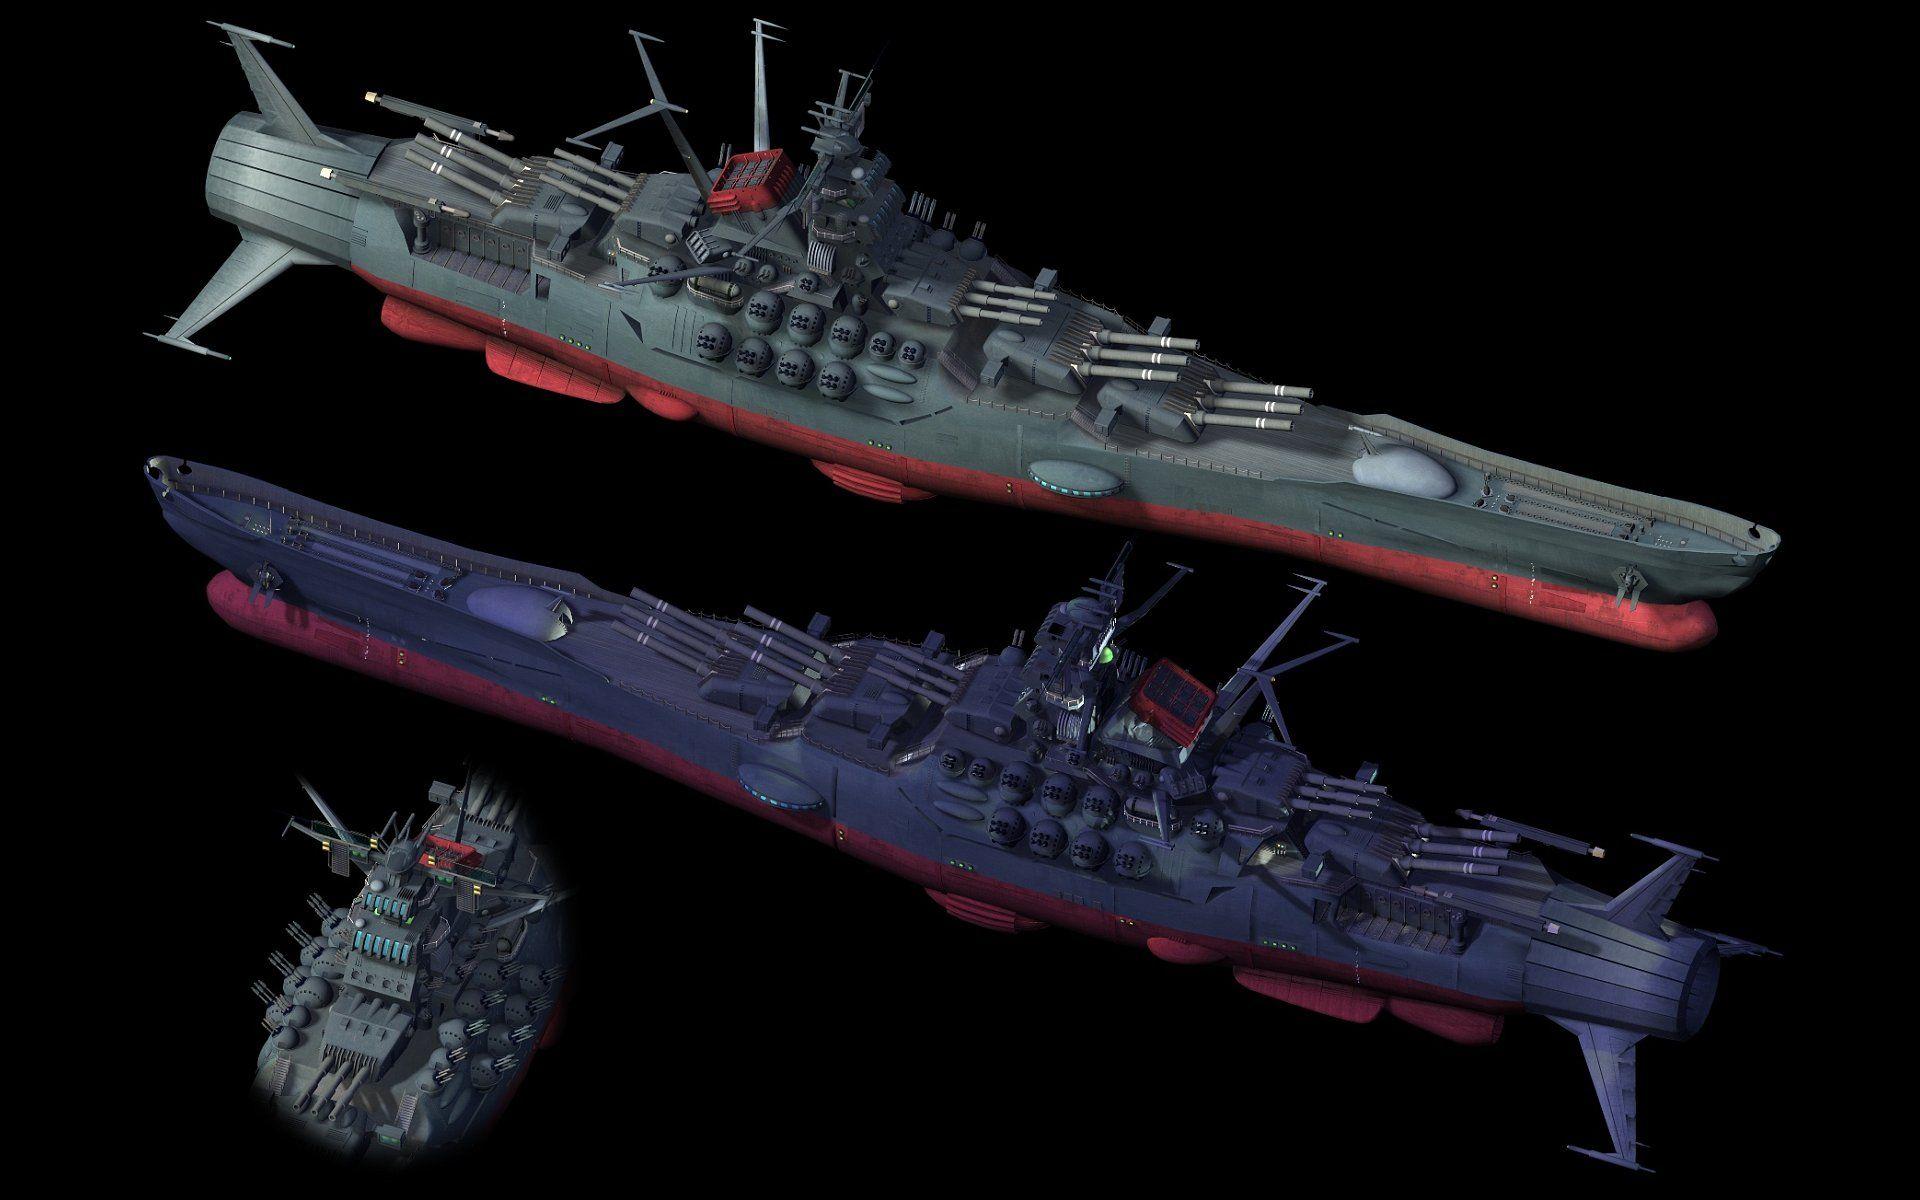 Battleship Yamato Computer Wallpapers Desktop Backgrounds 1920x1200 Id 151254 Battleship Yamato Space Battleship